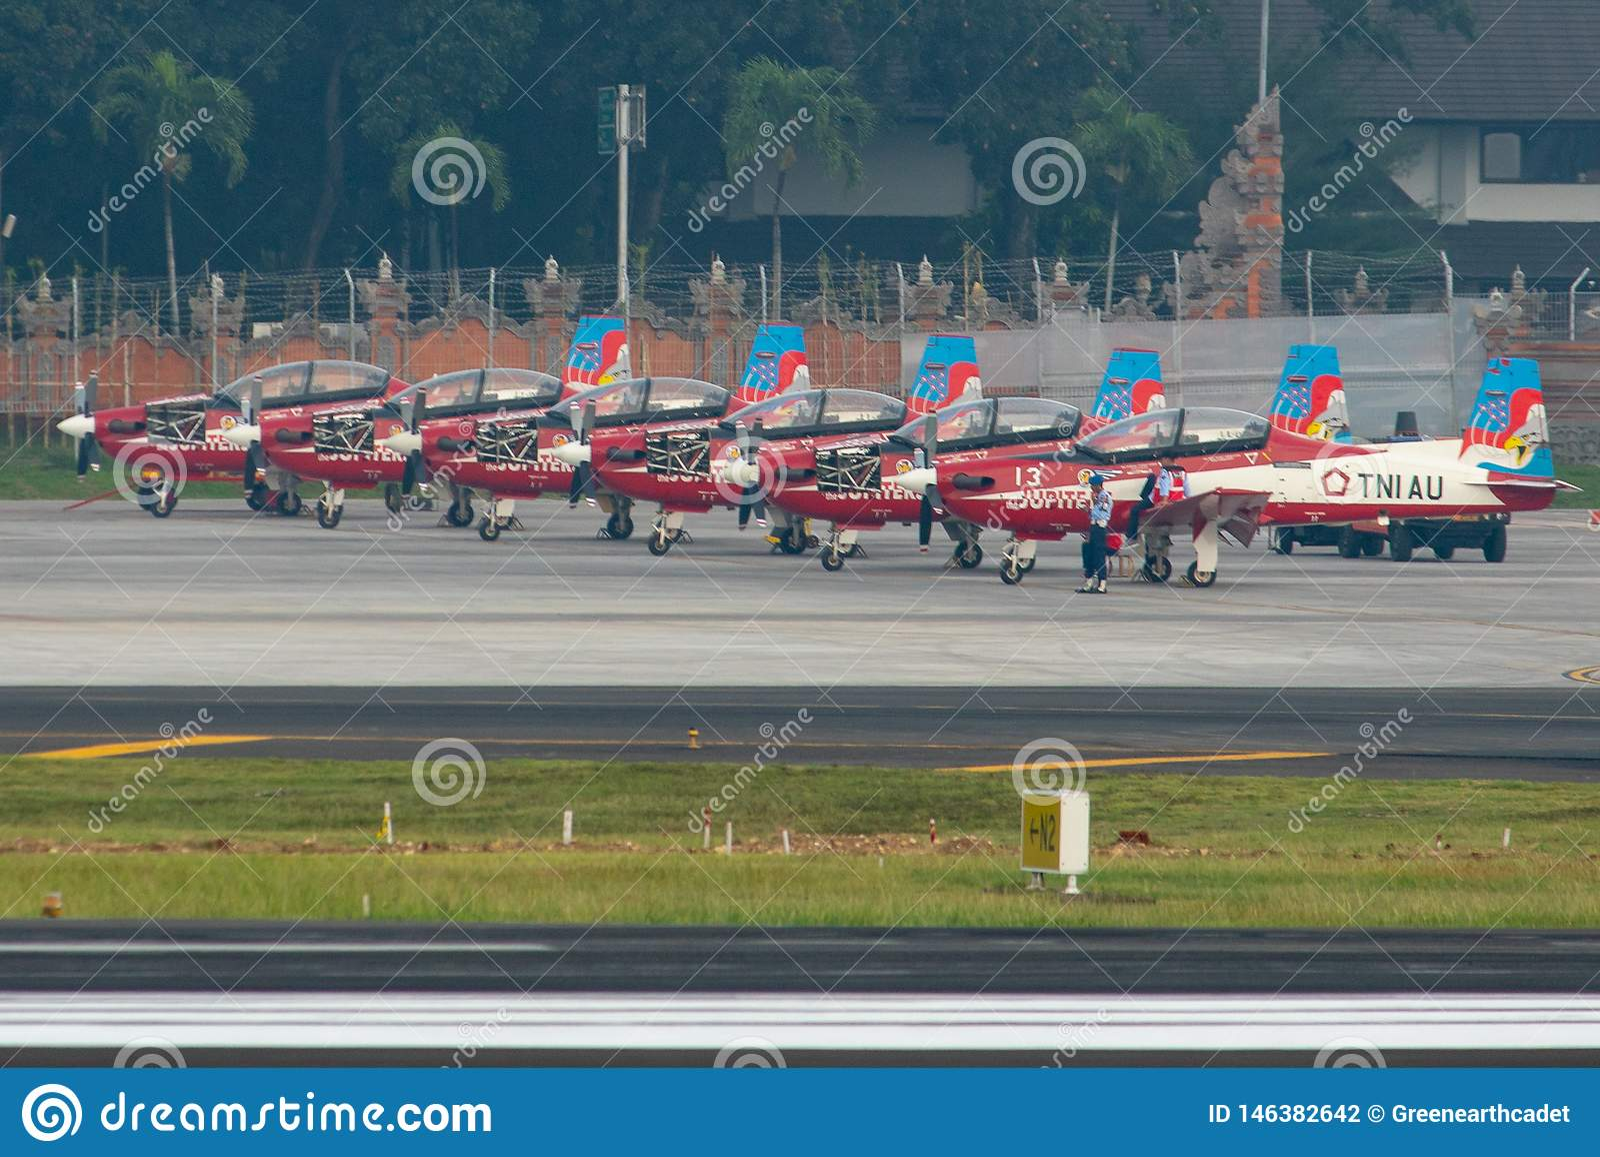 DENPASAR/BALI-APRIL 16 2019年:属于印度尼西亚空军的七架木星队飞机停放在围裙